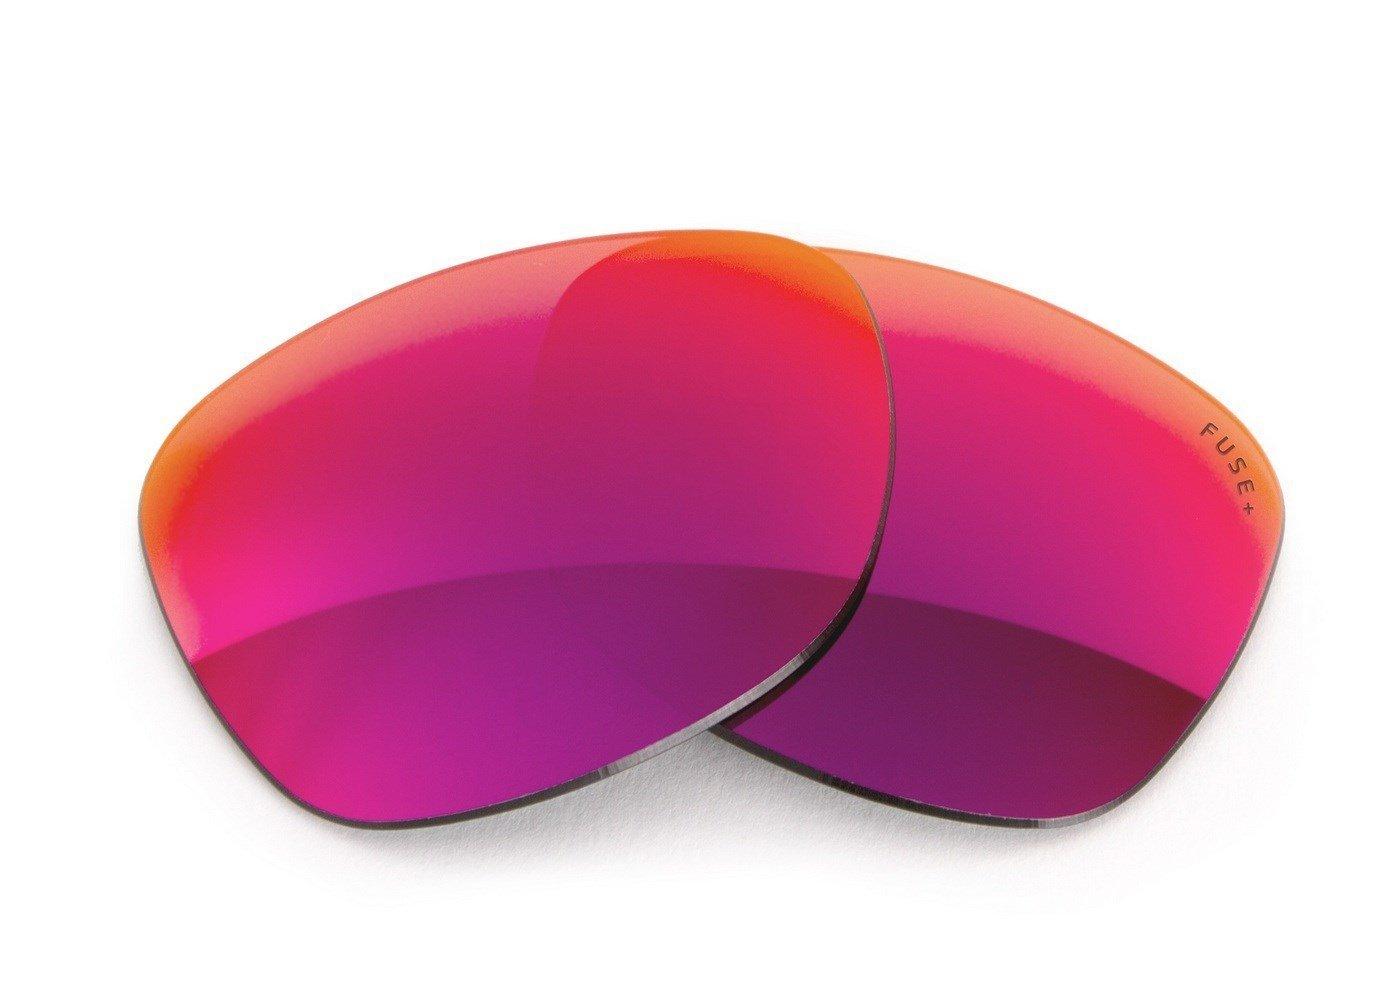 Fuse Lenses for Von Zipper Lesmore 101190-GMP-000000000